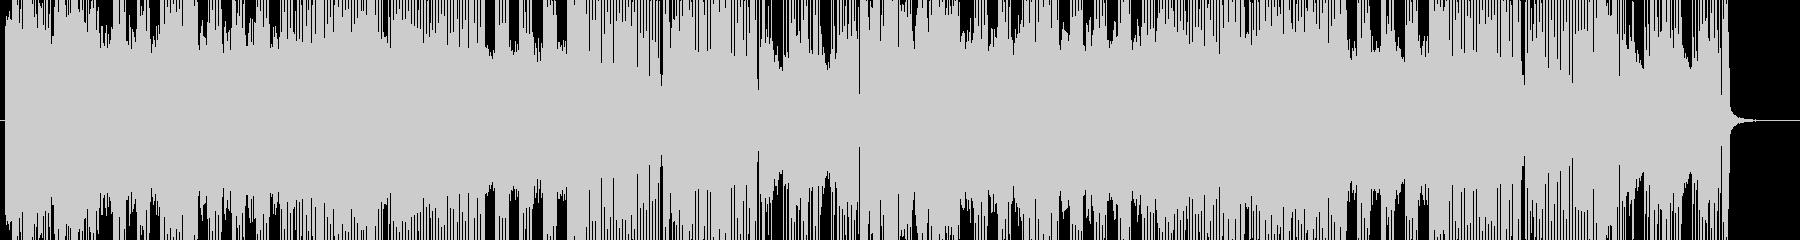 「HR/HM」「DARK」BGM51の未再生の波形